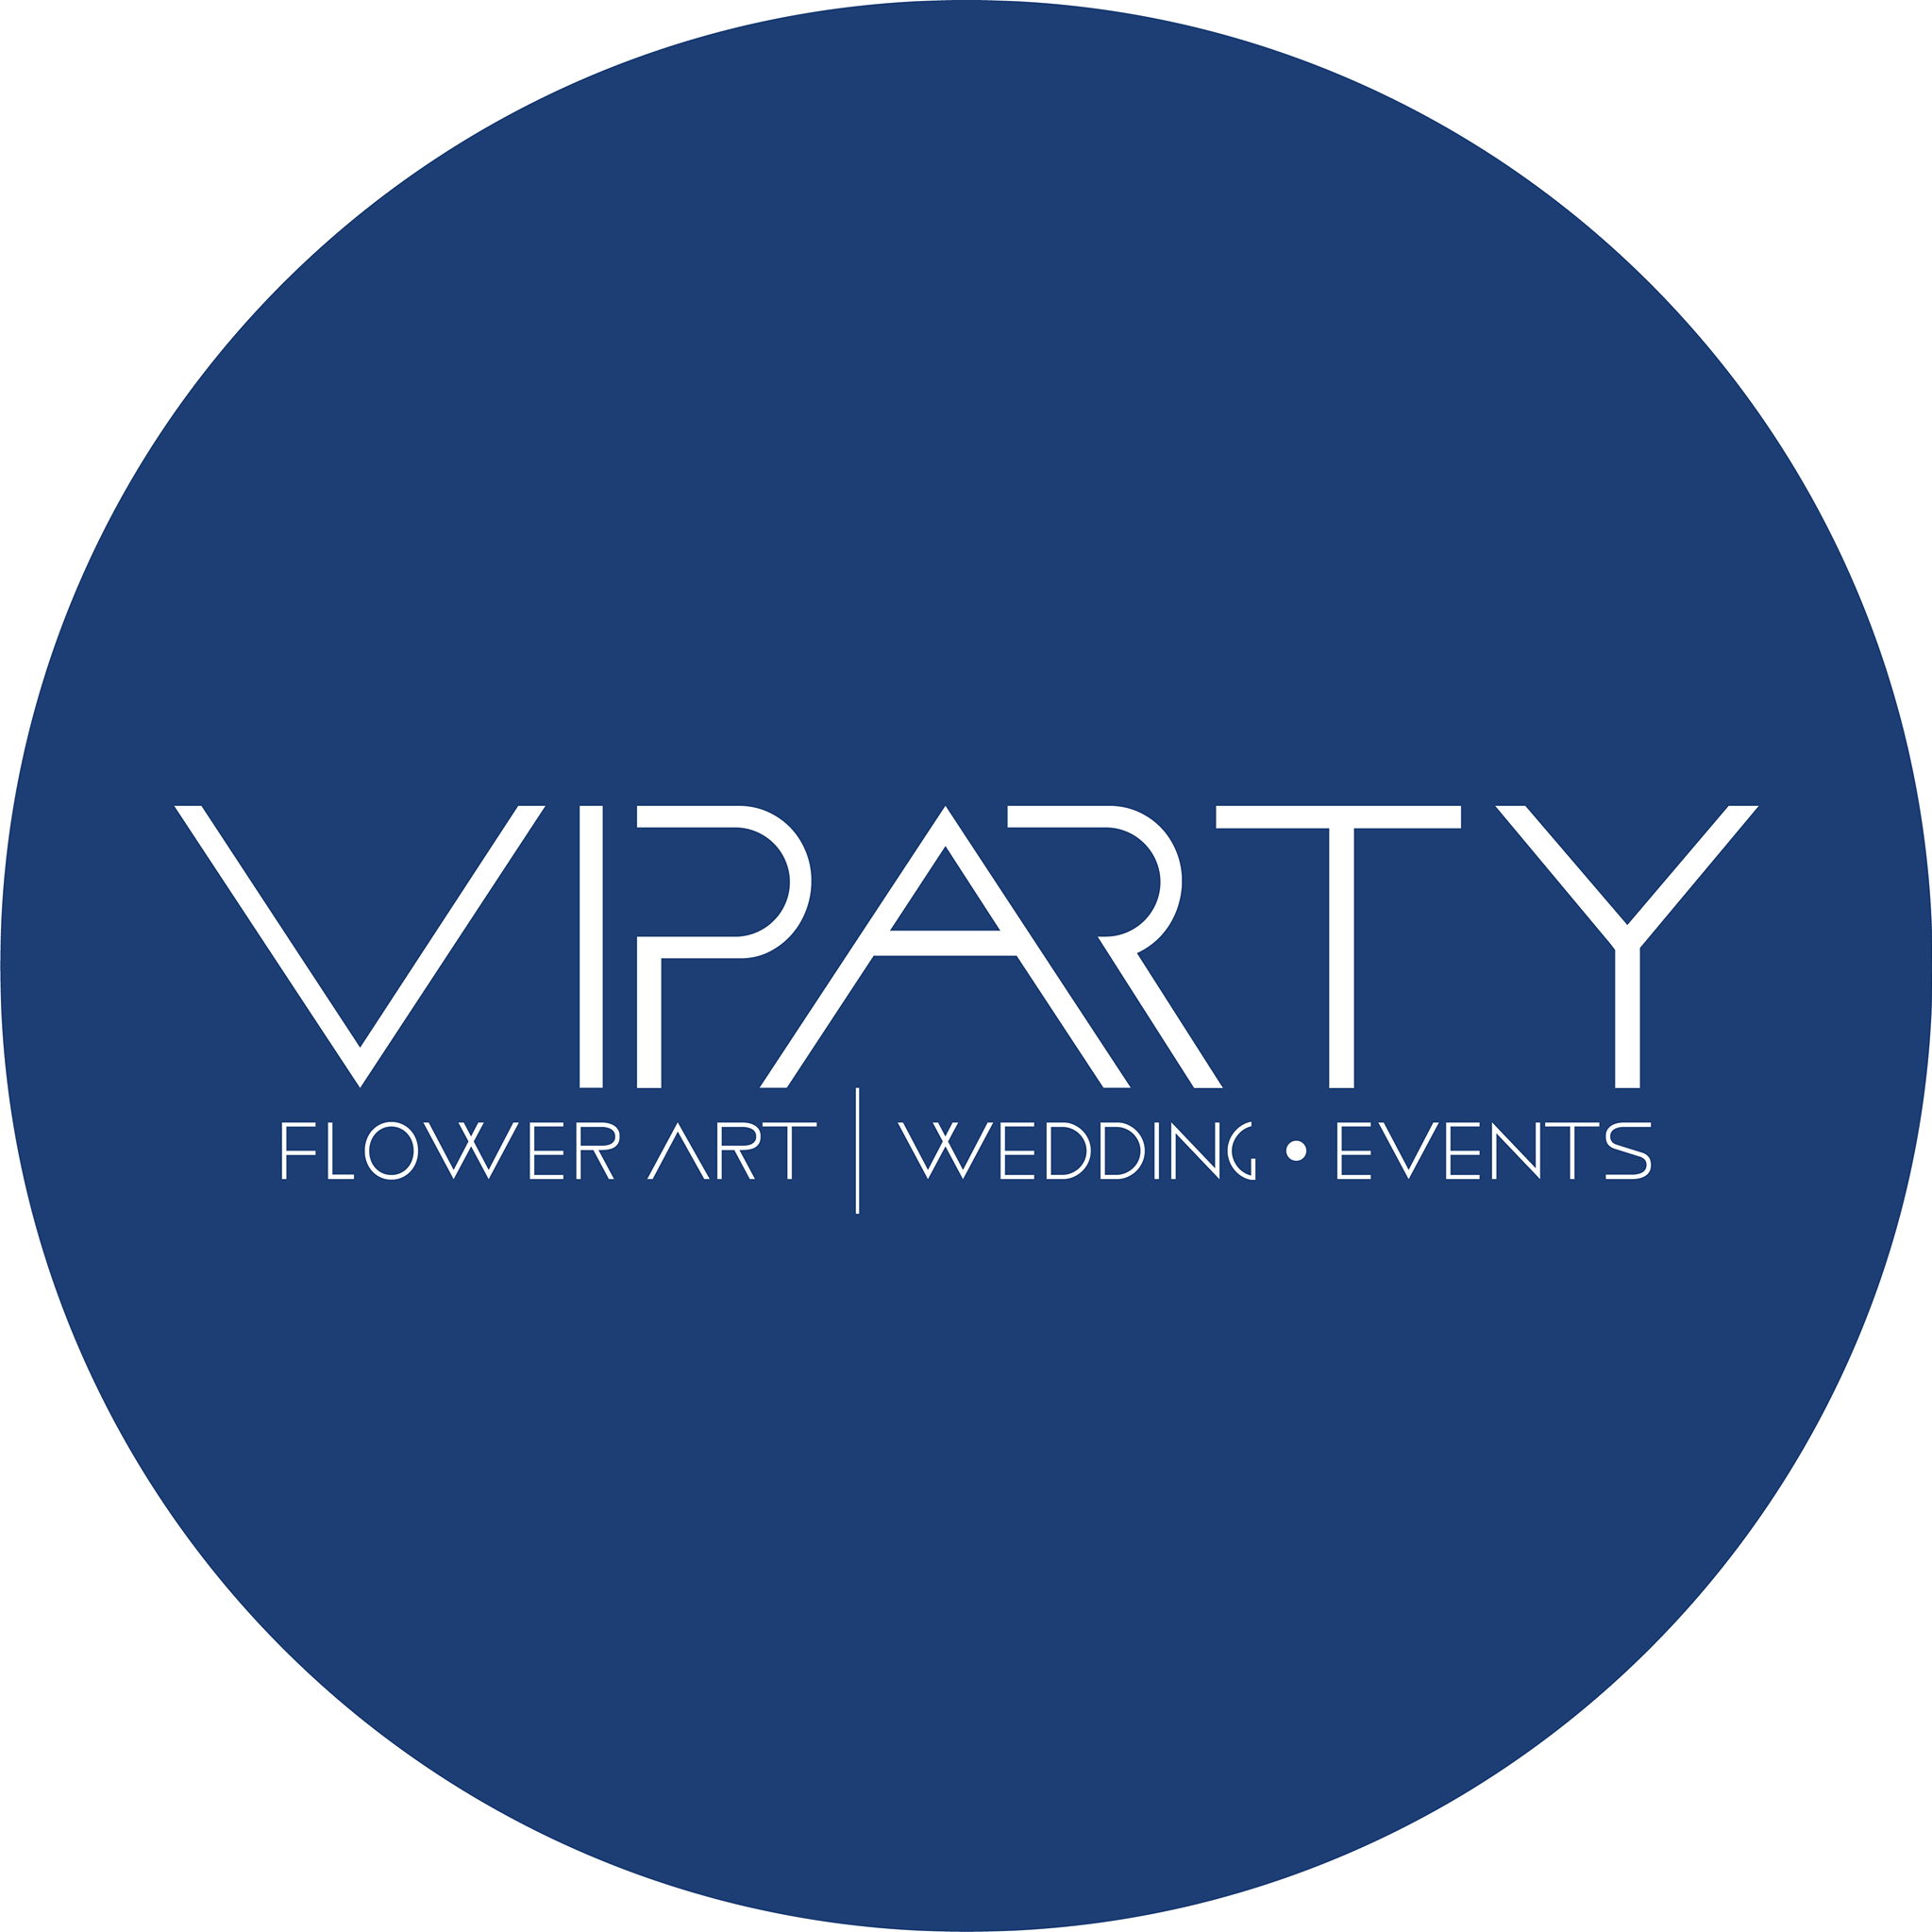 VIP PARTY - TRANG TRÍ BACKDROP HOA GIẤY